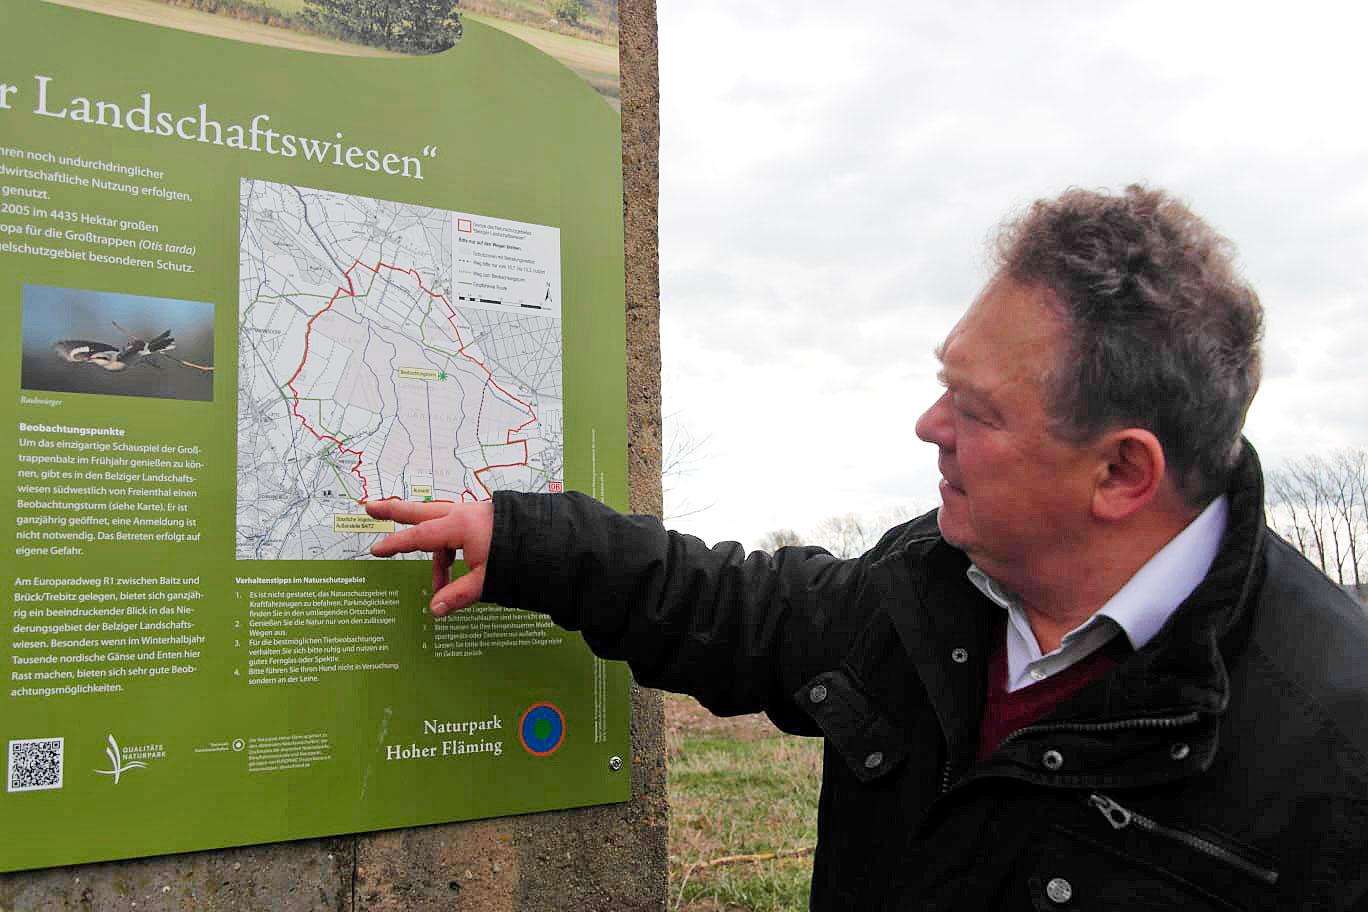 Andreas-Koska-Landschaftswiesen